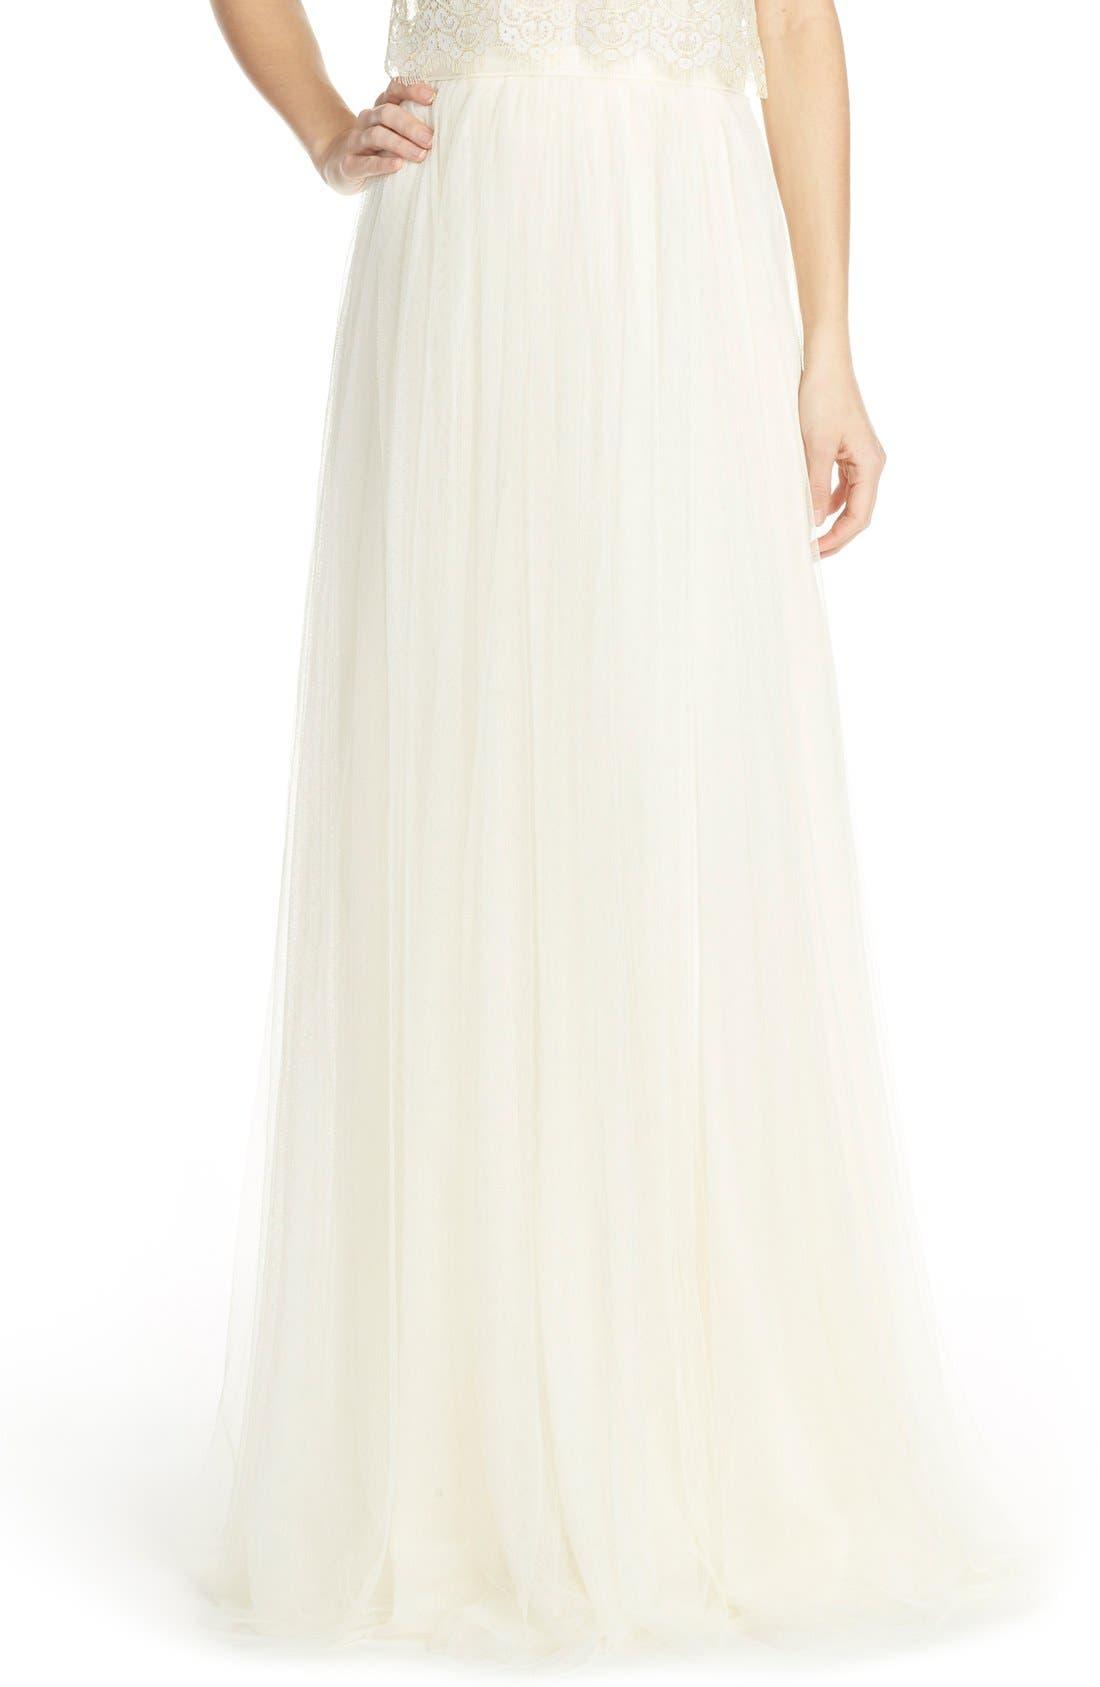 Alternate Image 1 Selected - Jenny Yoo 'Arabella' Tulle Ballgown Skirt